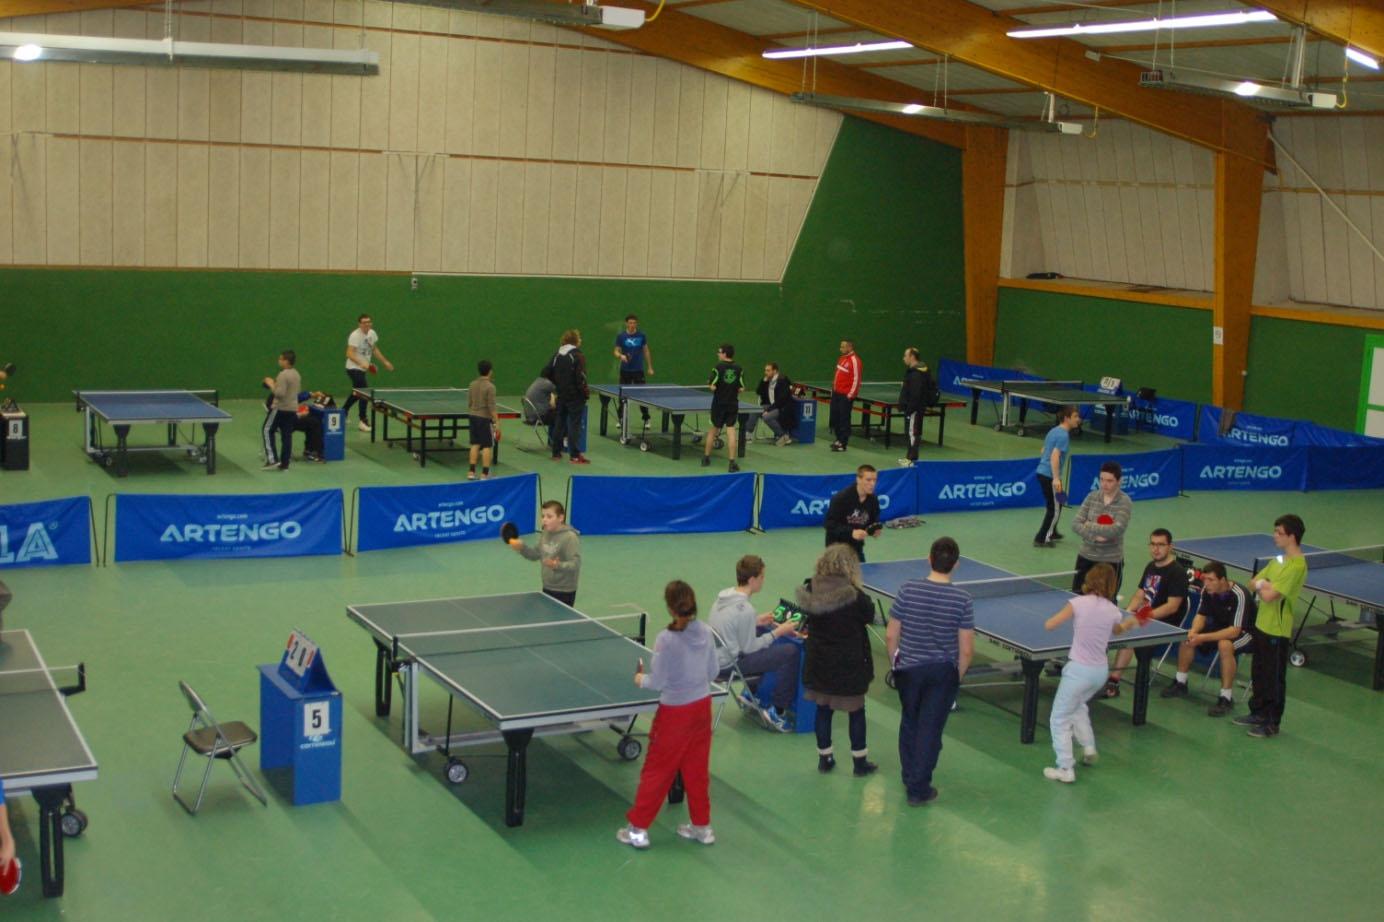 Club slctt tennis de table ch teaubernard page 5 - Wake sport tennis de table ...